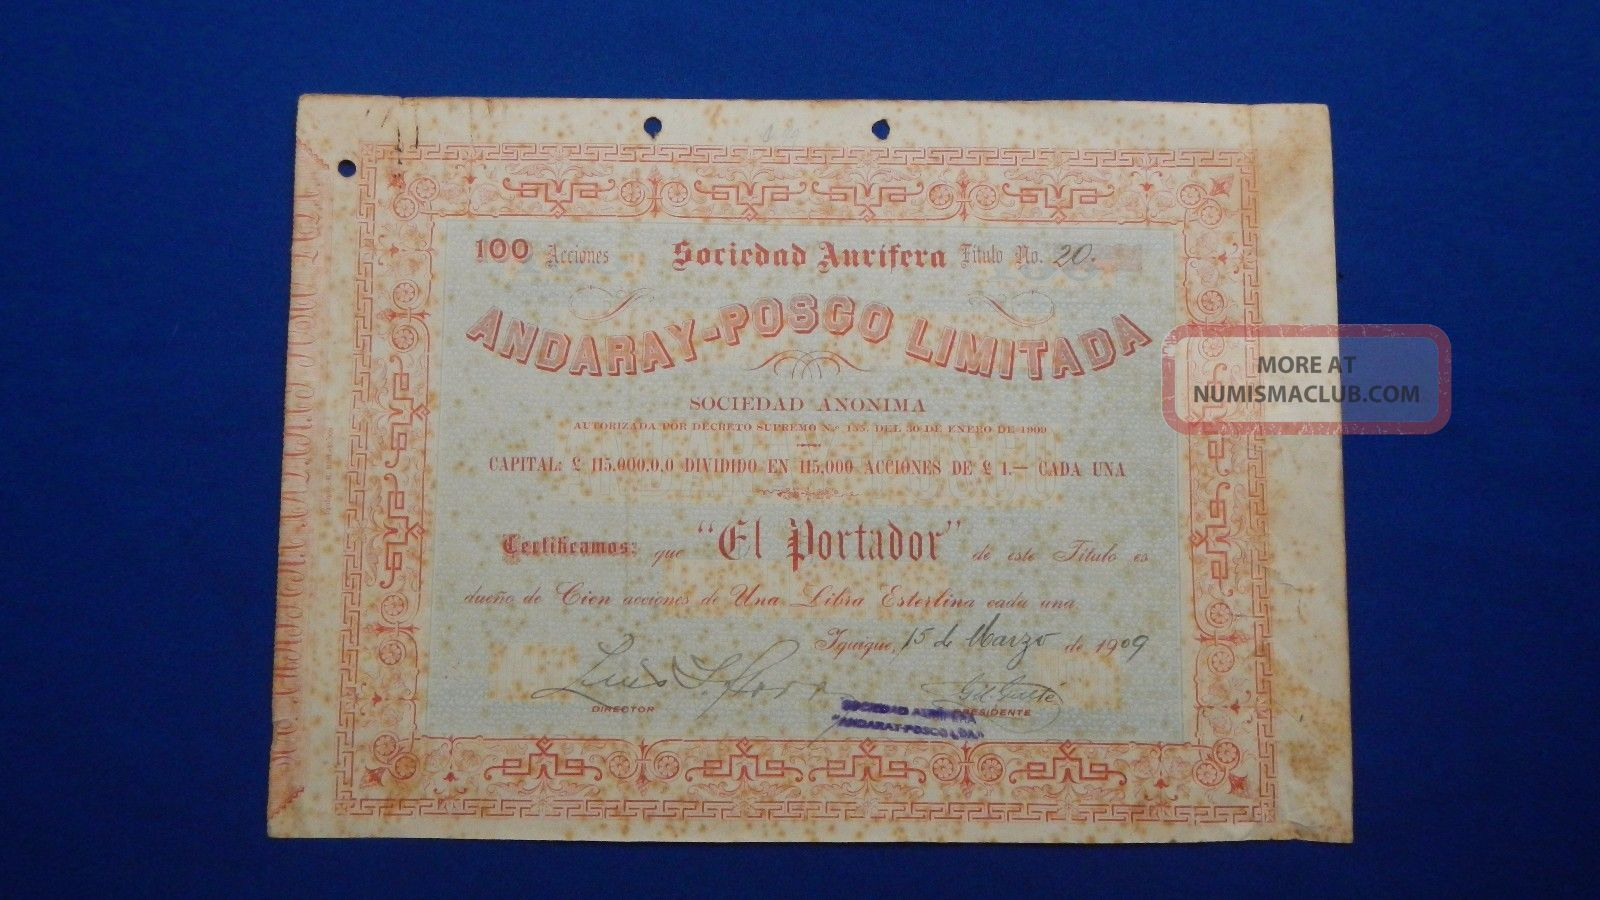 Sociedad Aurifera Andaray - Posco Limitada S.  A,  100 Actions,  Iquique - Chile.  1909. Stocks & Bonds, Scripophily photo